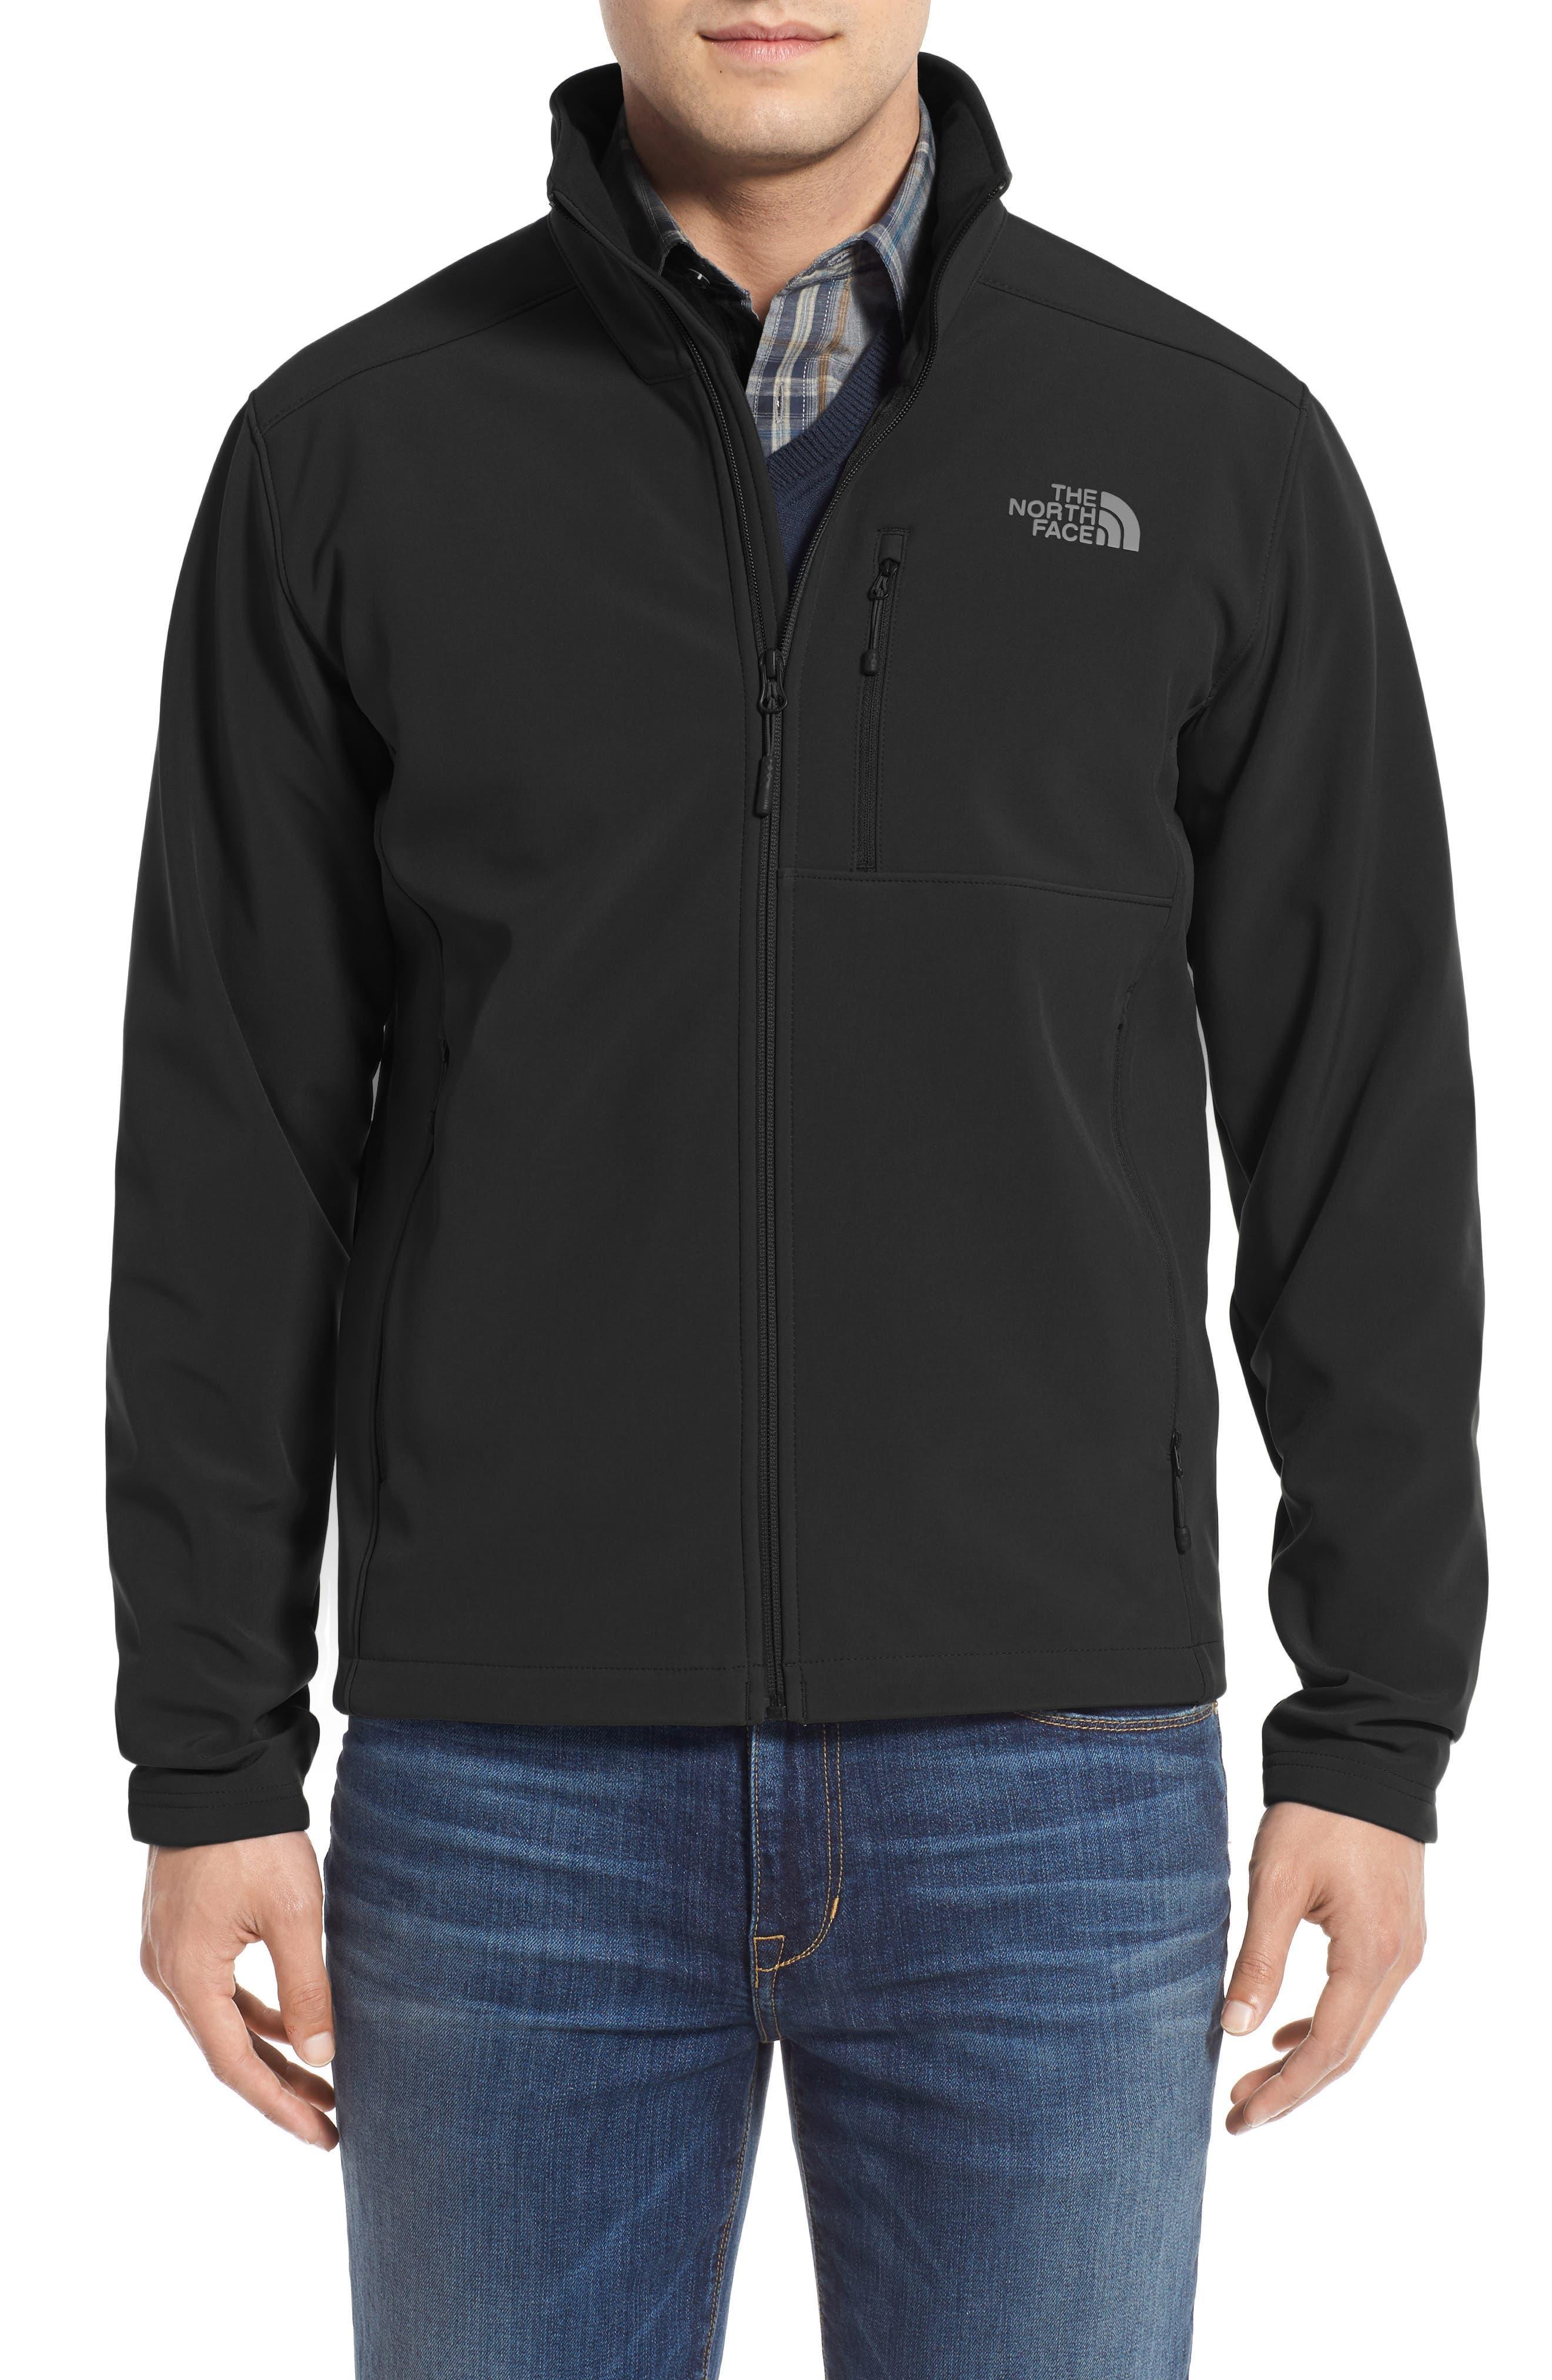 Apex Bionic 2 Water Repllent Jacket,                         Main,                         color, TNF BLACK